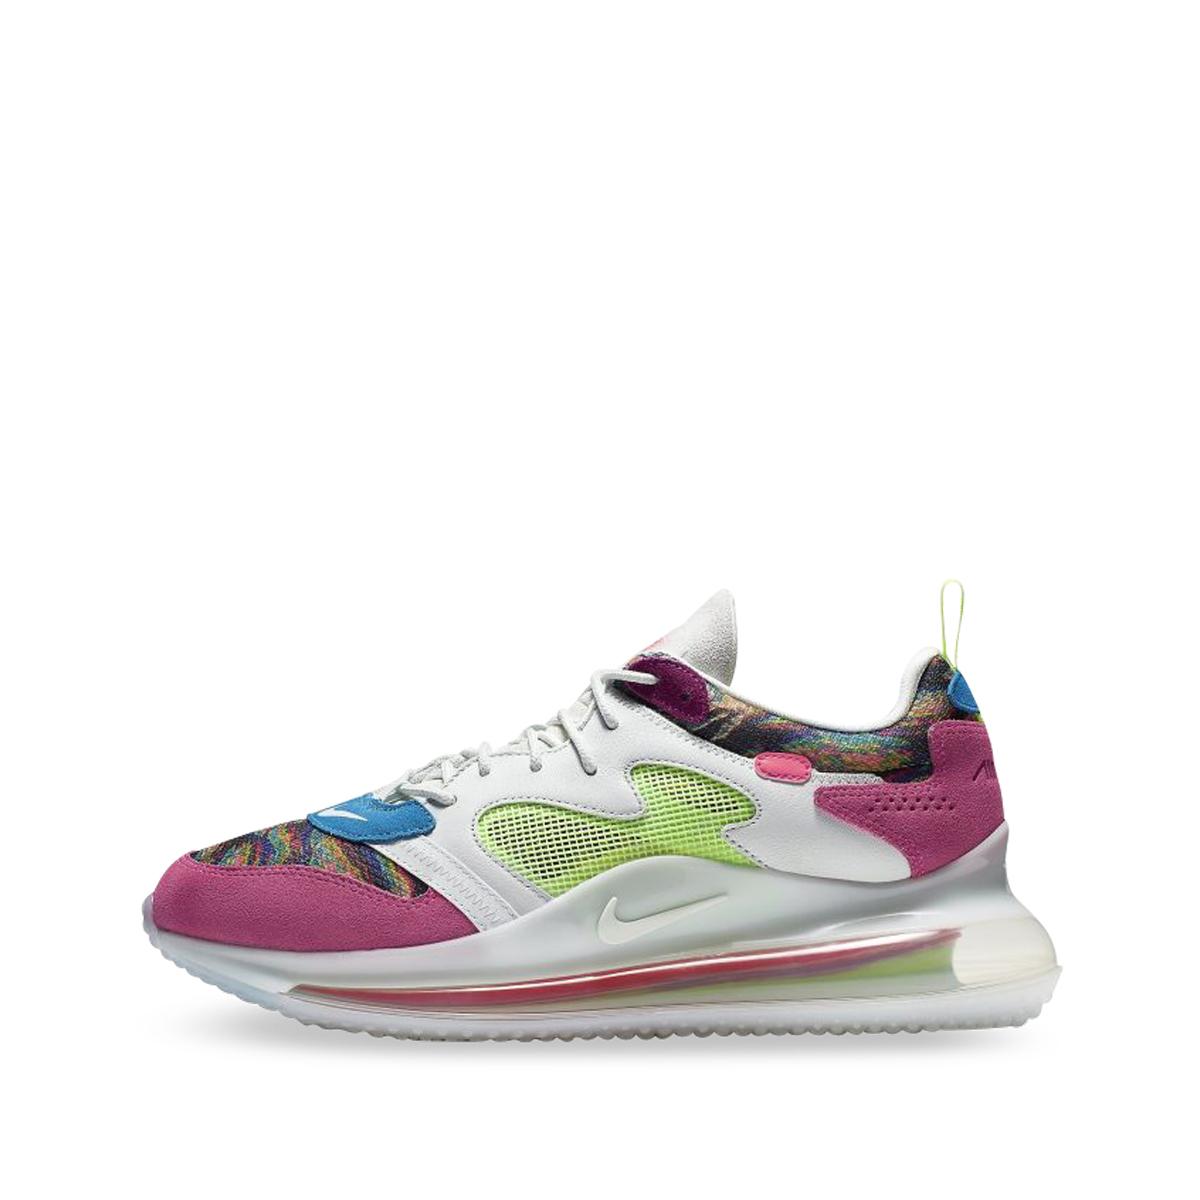 Nike Odell Beckham Jr.'s Air Max 720